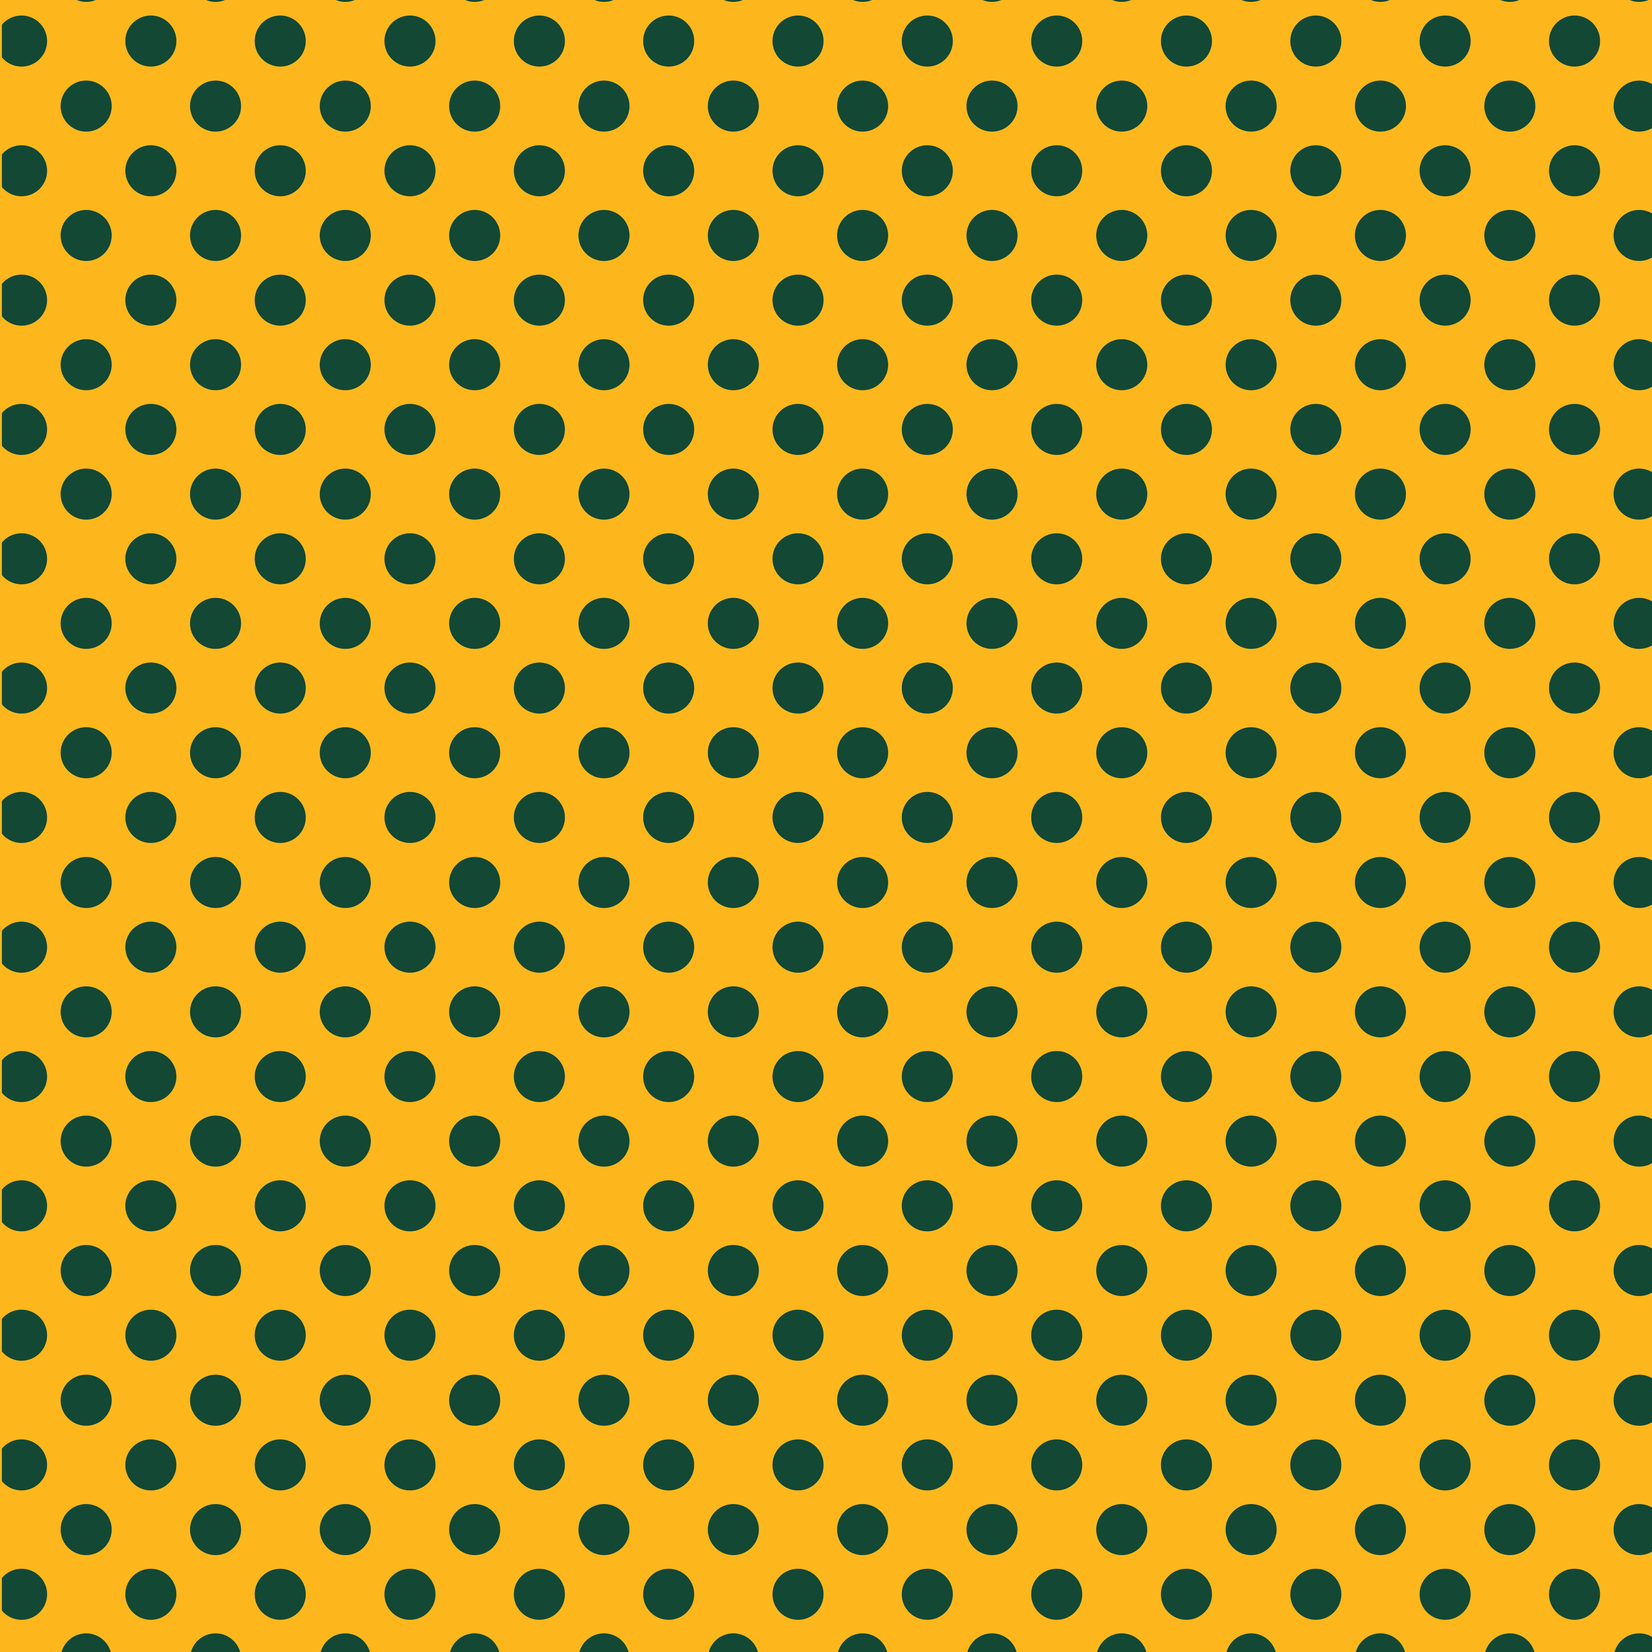 TVD Polka Dot